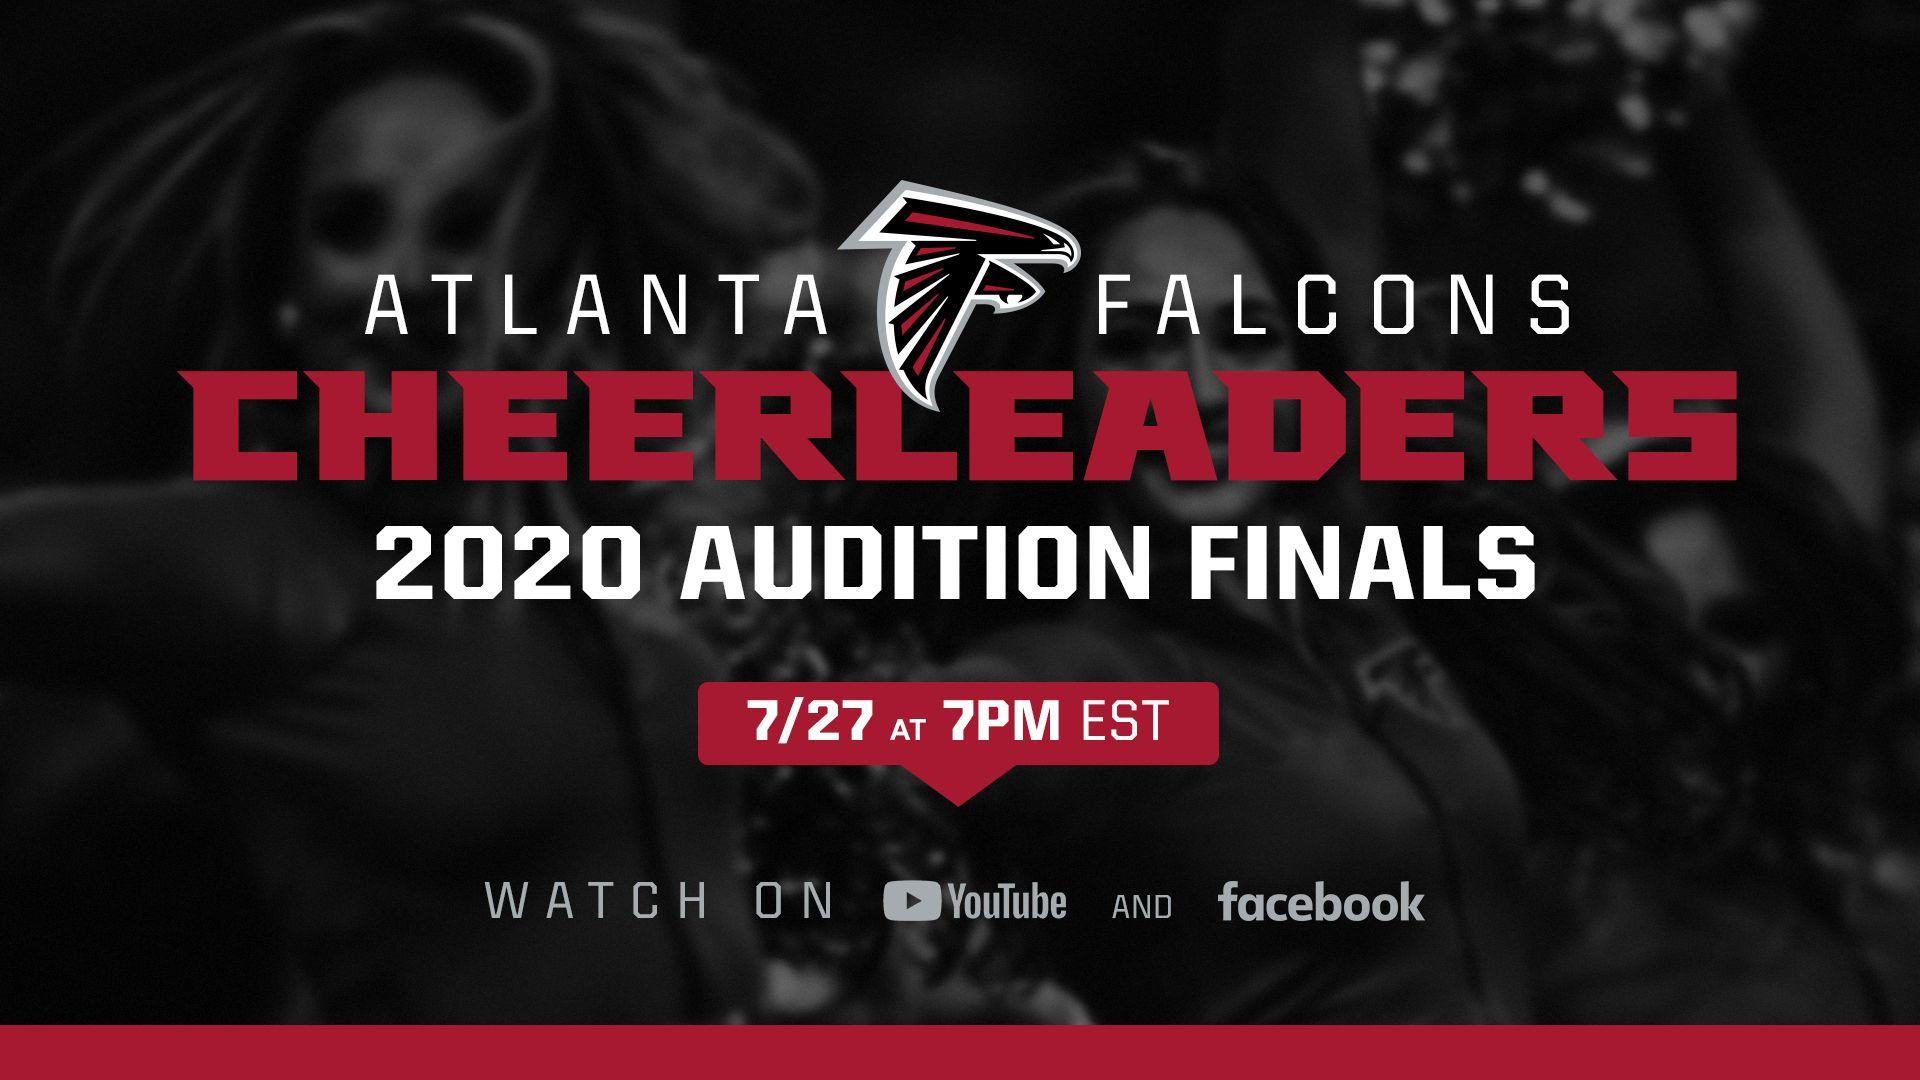 Atlanta Falcons Cheerleaders 2020 Audition Finals